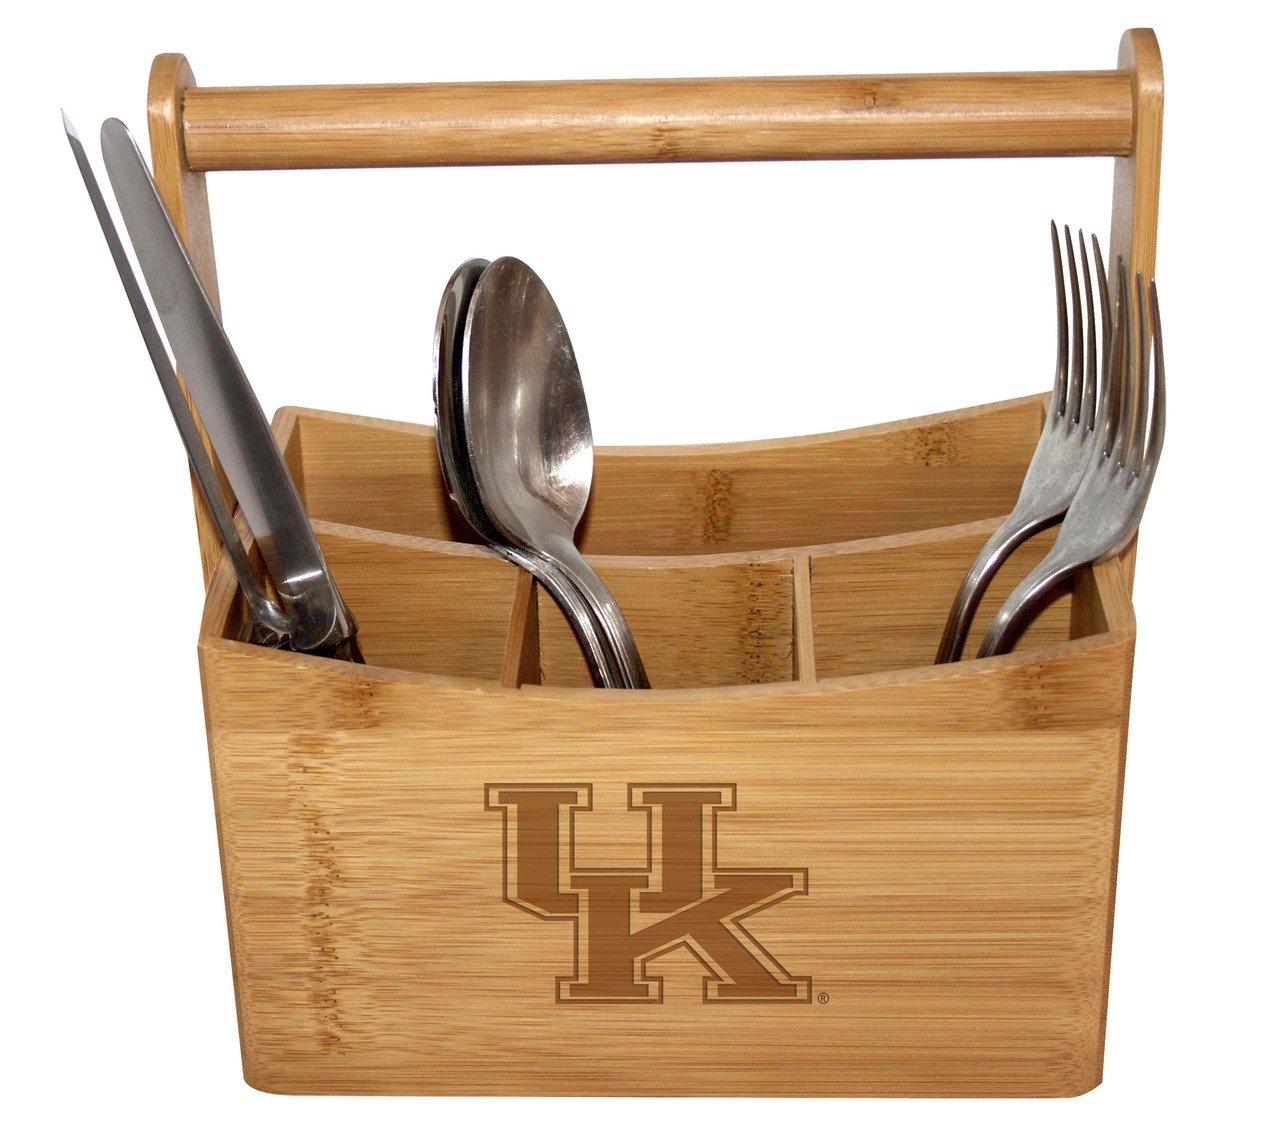 Kentucky Bamboo Caddy